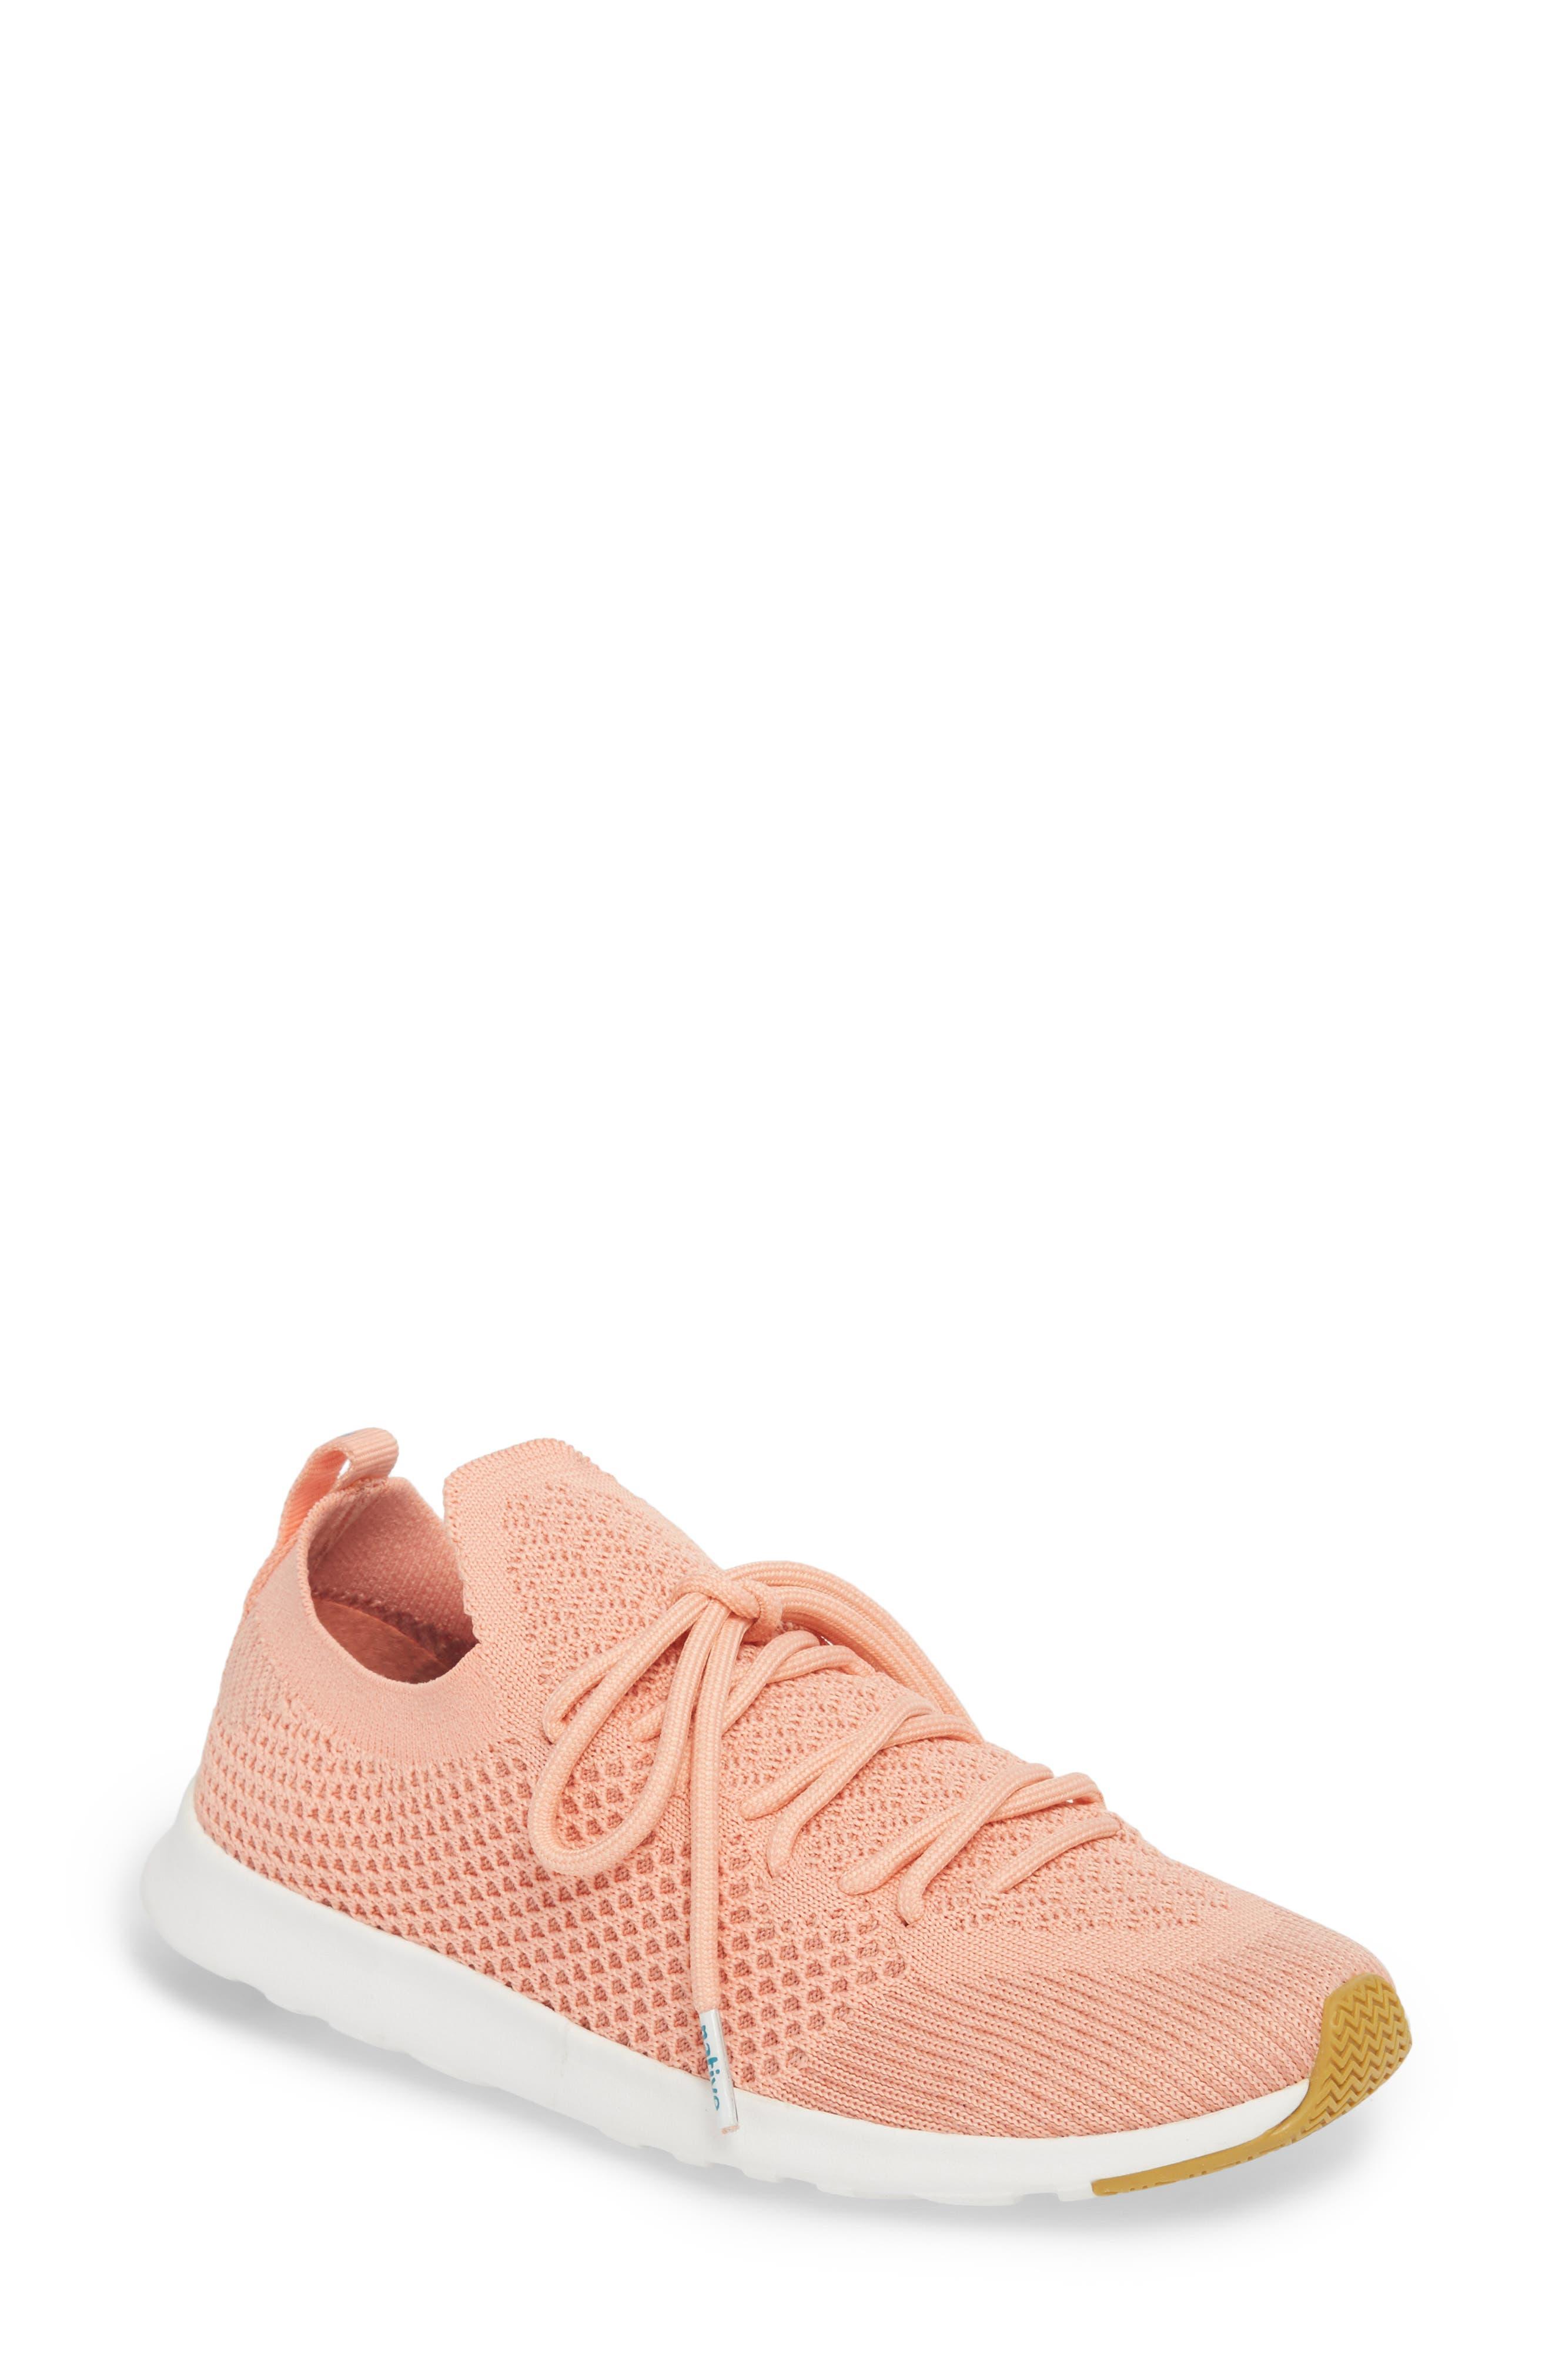 AP Mercury Liteknit Sneaker,                         Main,                         color, Clay Pink/ Shell White